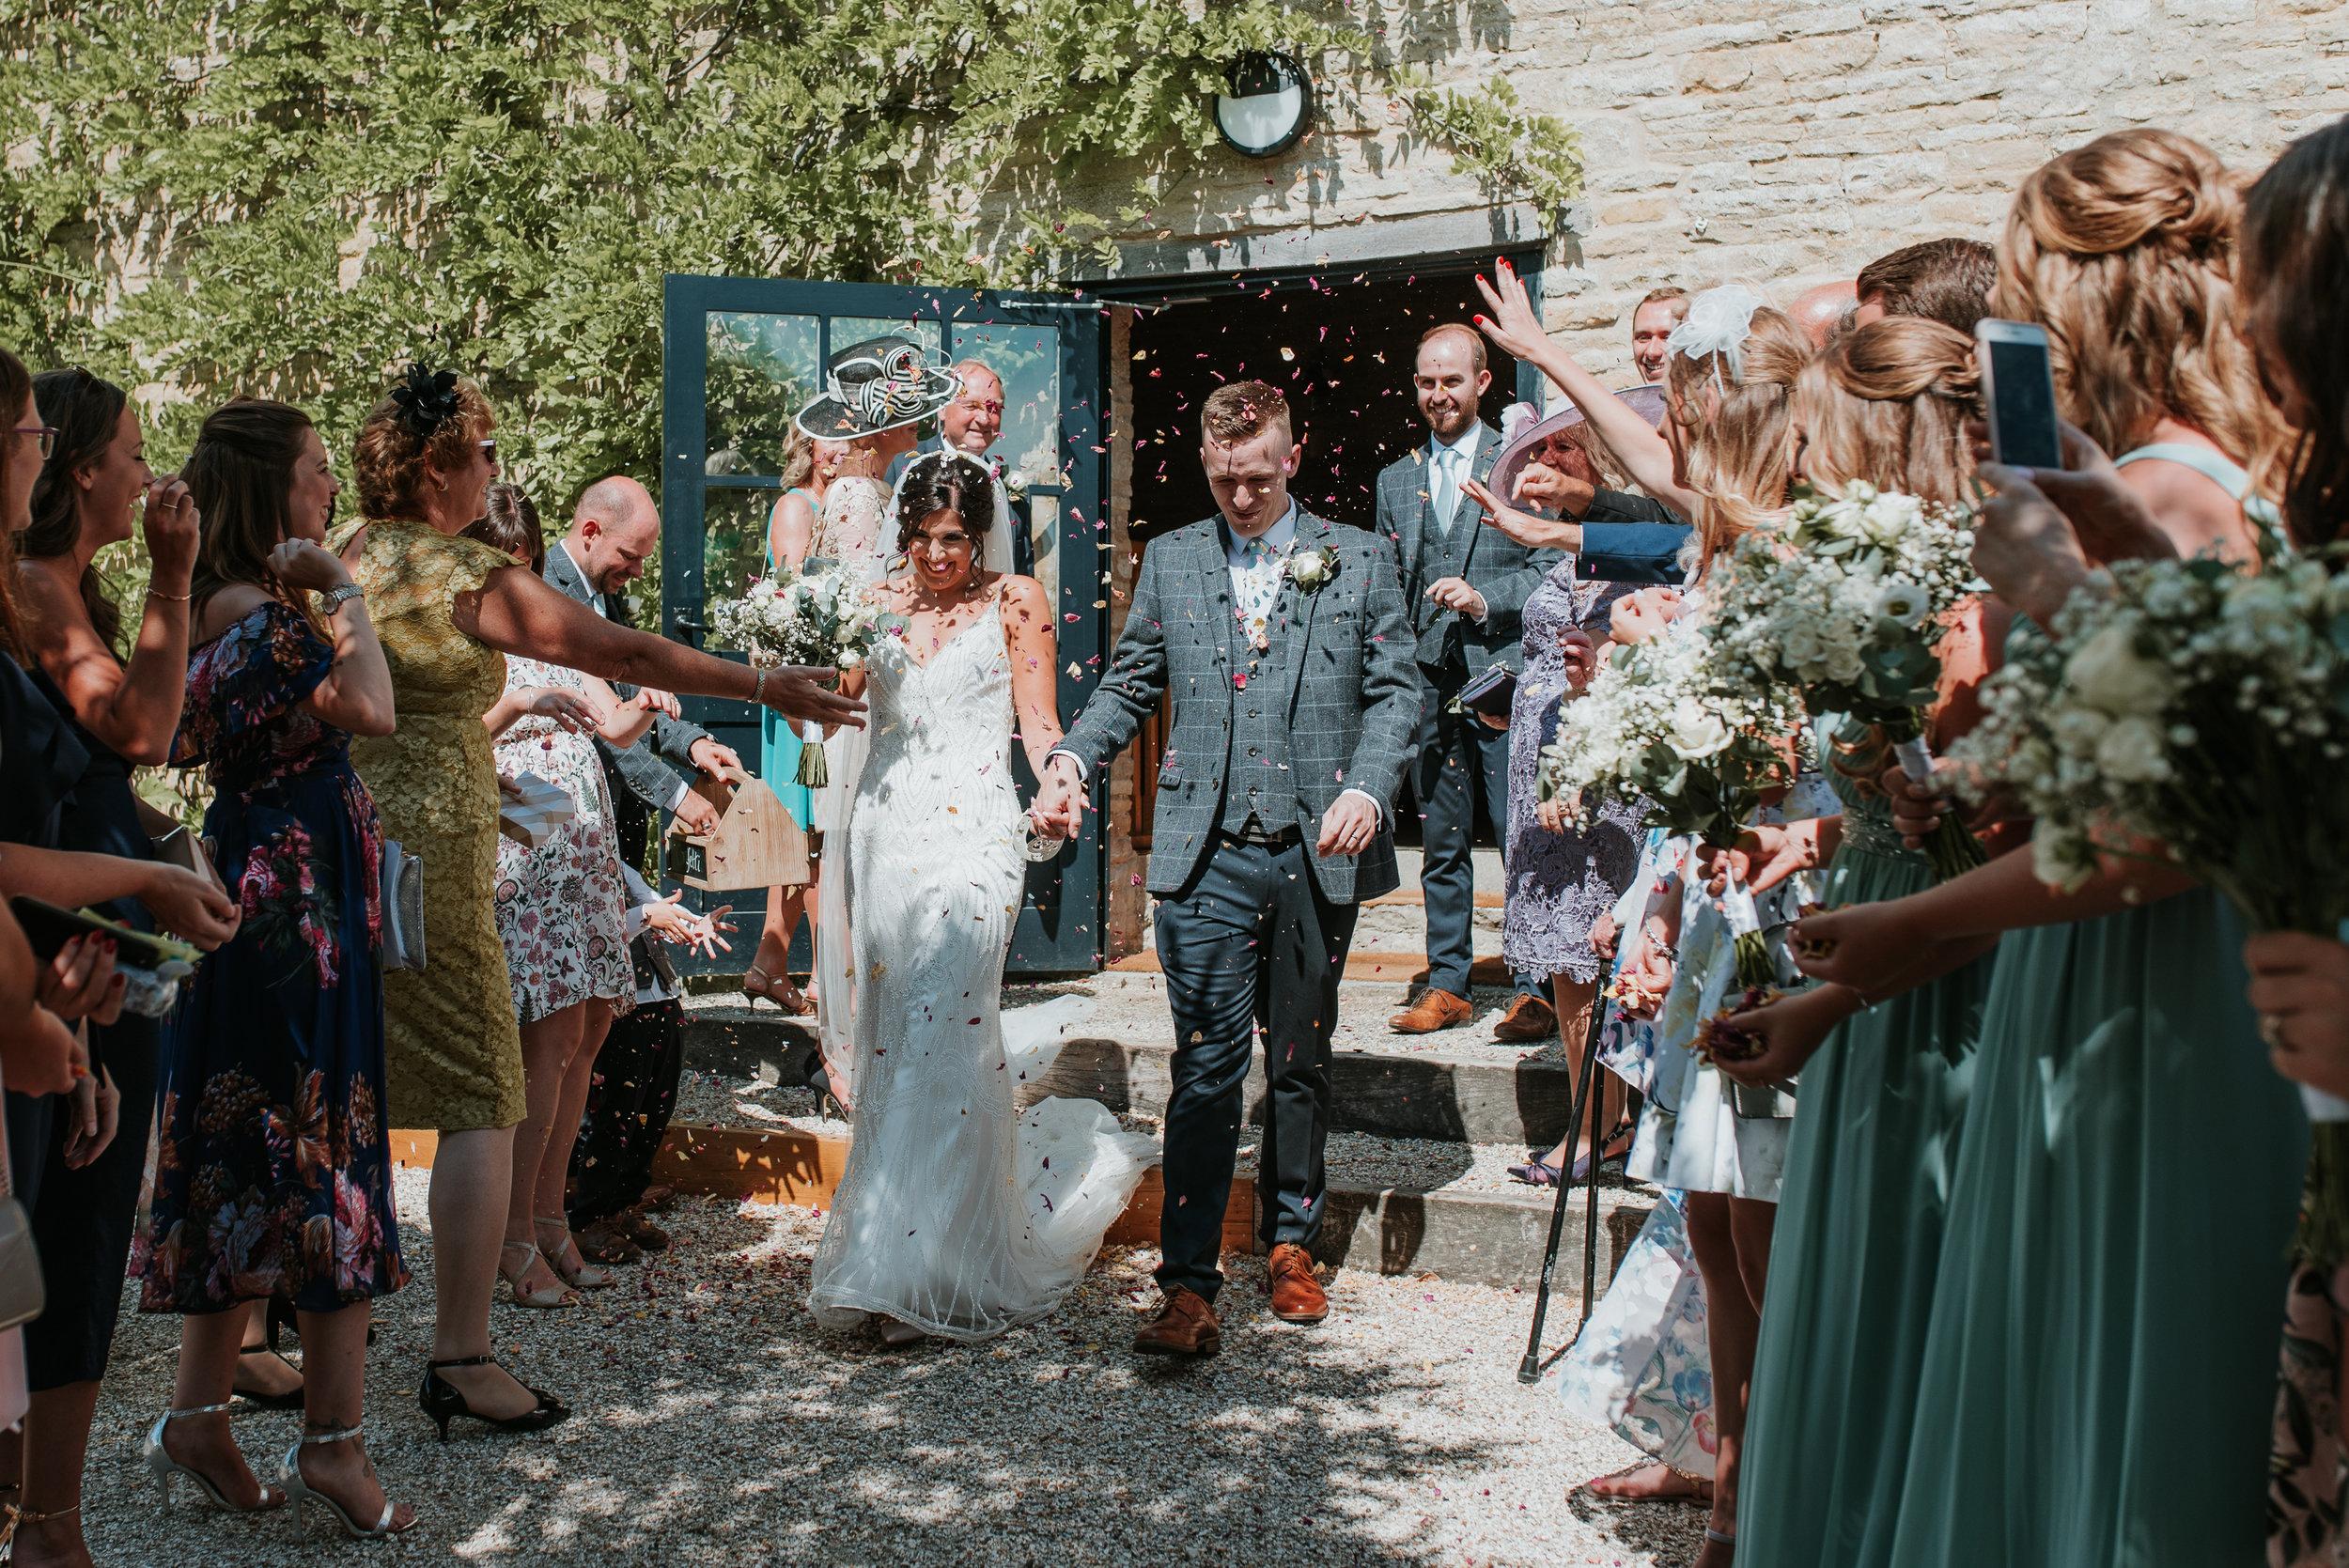 Oxfordshire-wedding-photographer-43.jpg